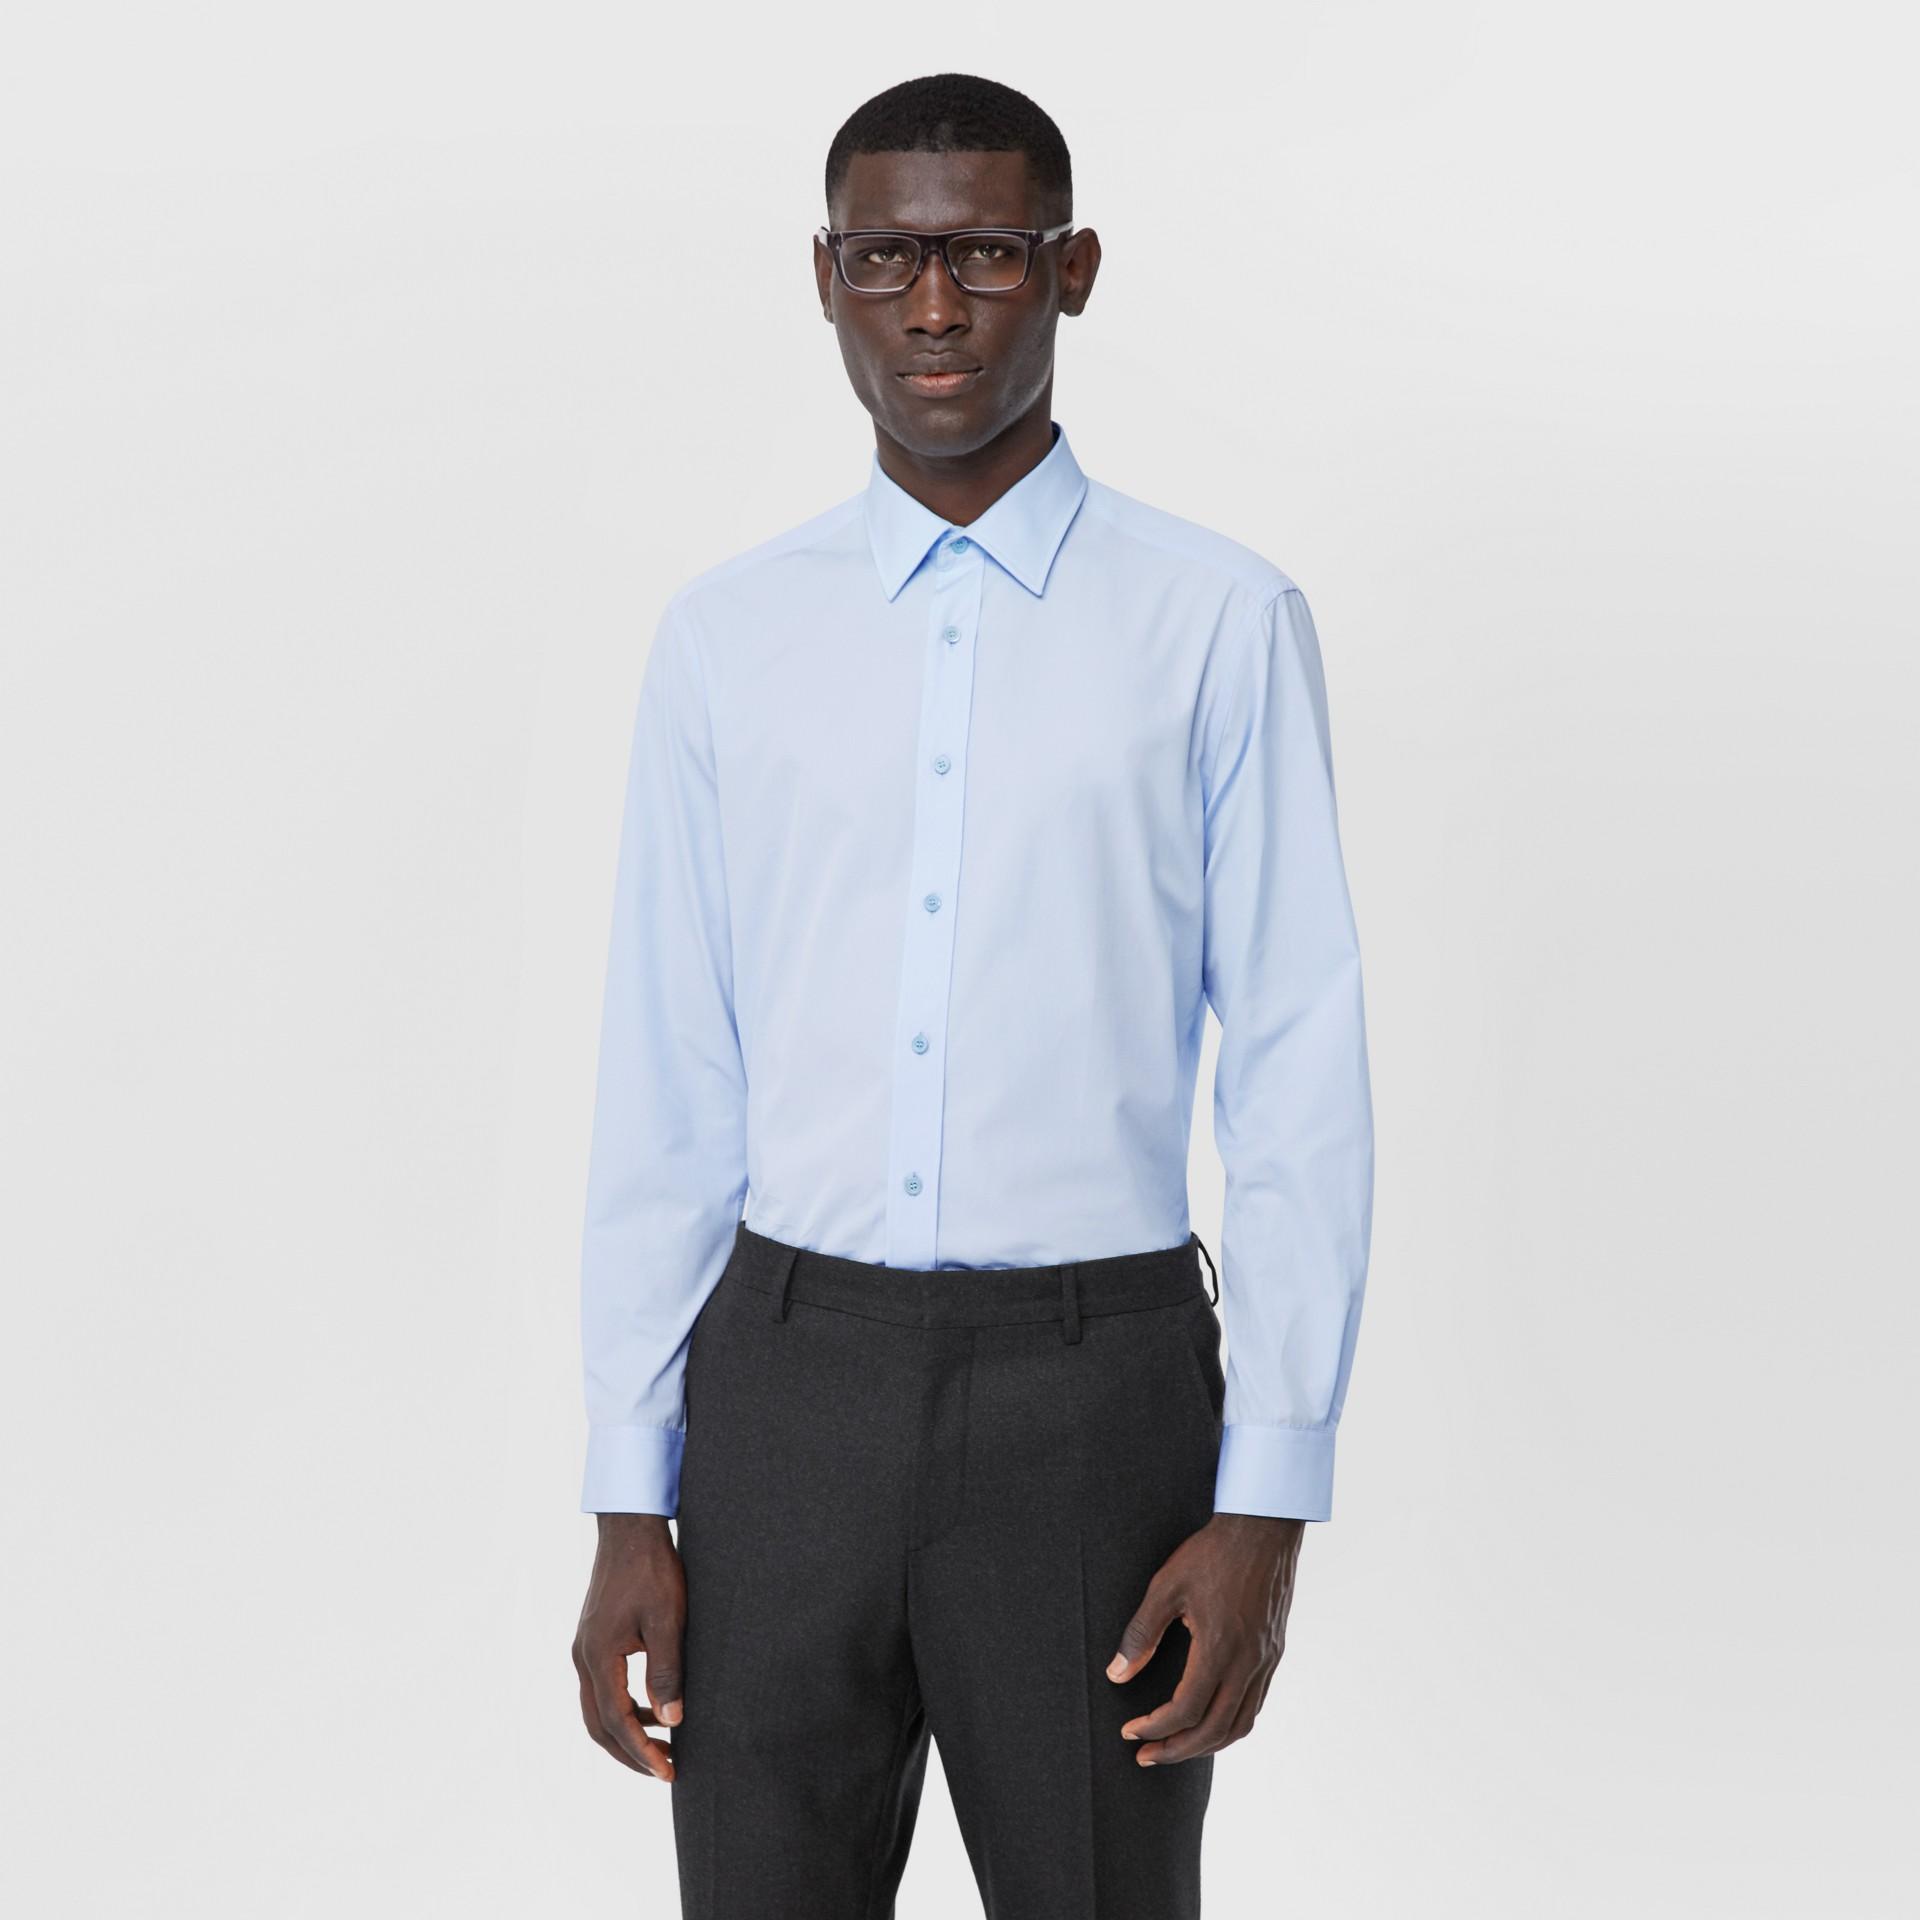 Classic Fit Monogram Motif Cotton Poplin Shirt in Pale Blue - Men | Burberry Singapore - gallery image 5